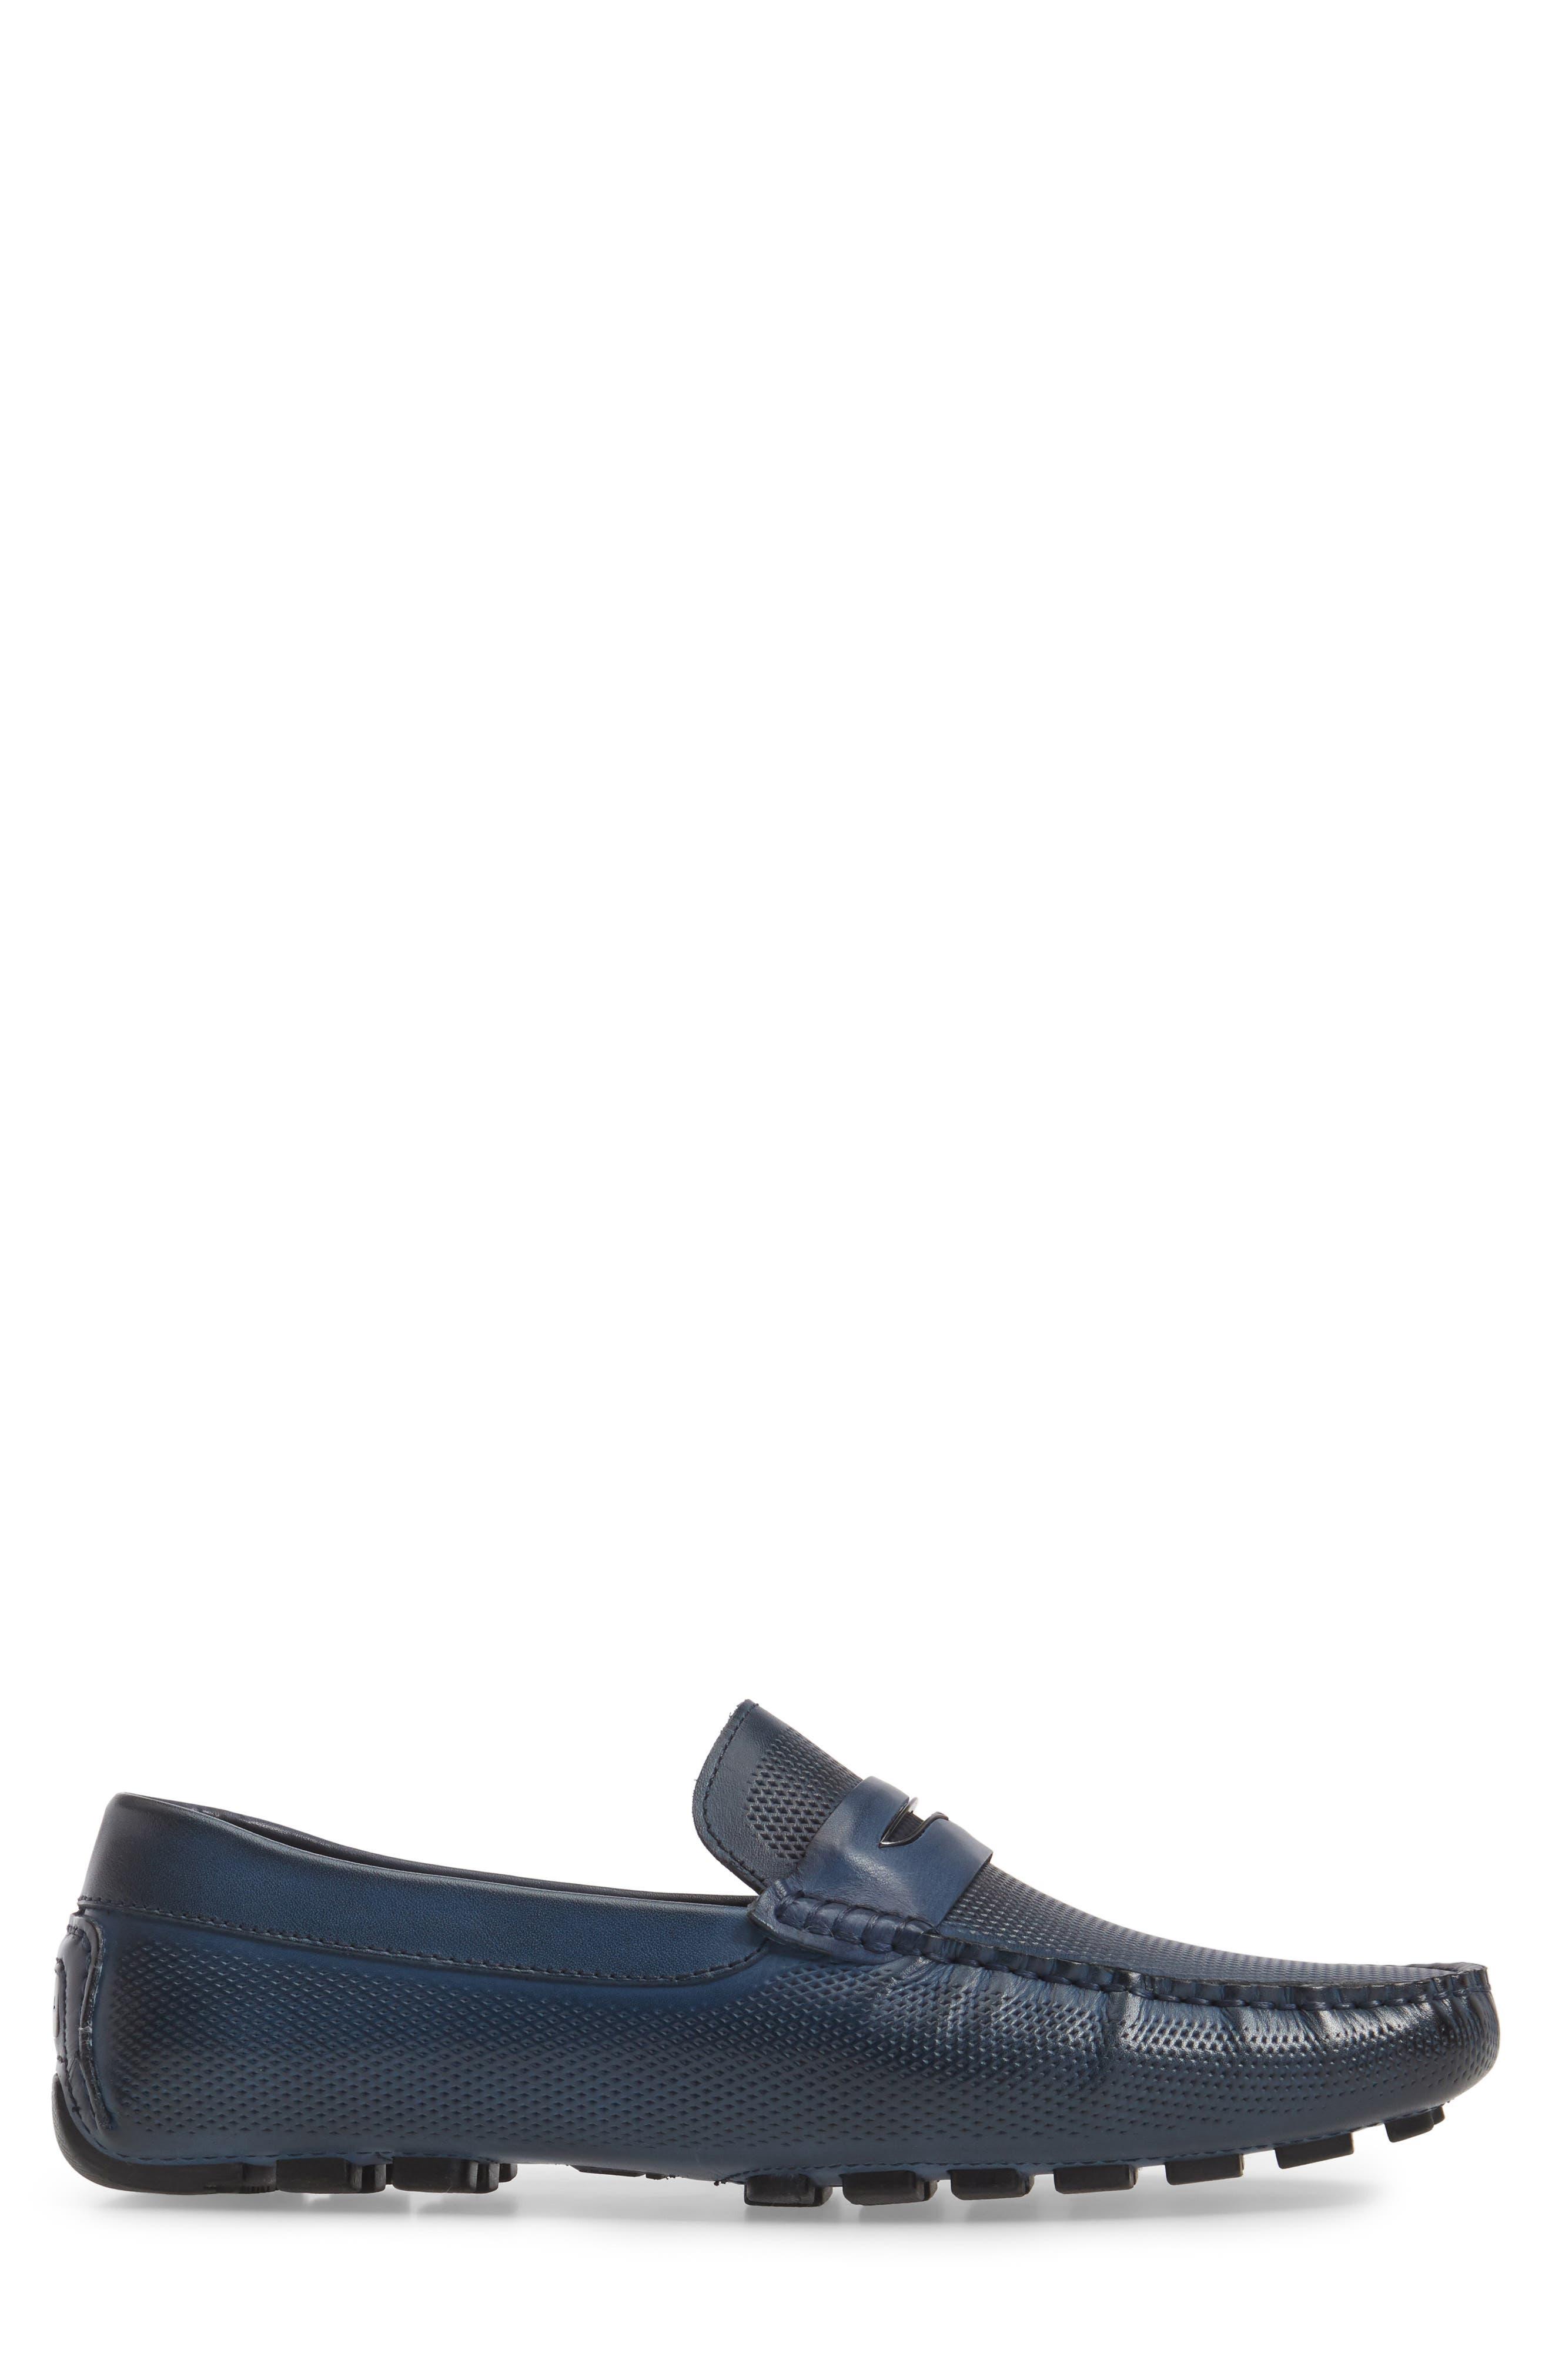 Alternate Image 3  - Zanzara Mondrian Driving Shoe (Men)